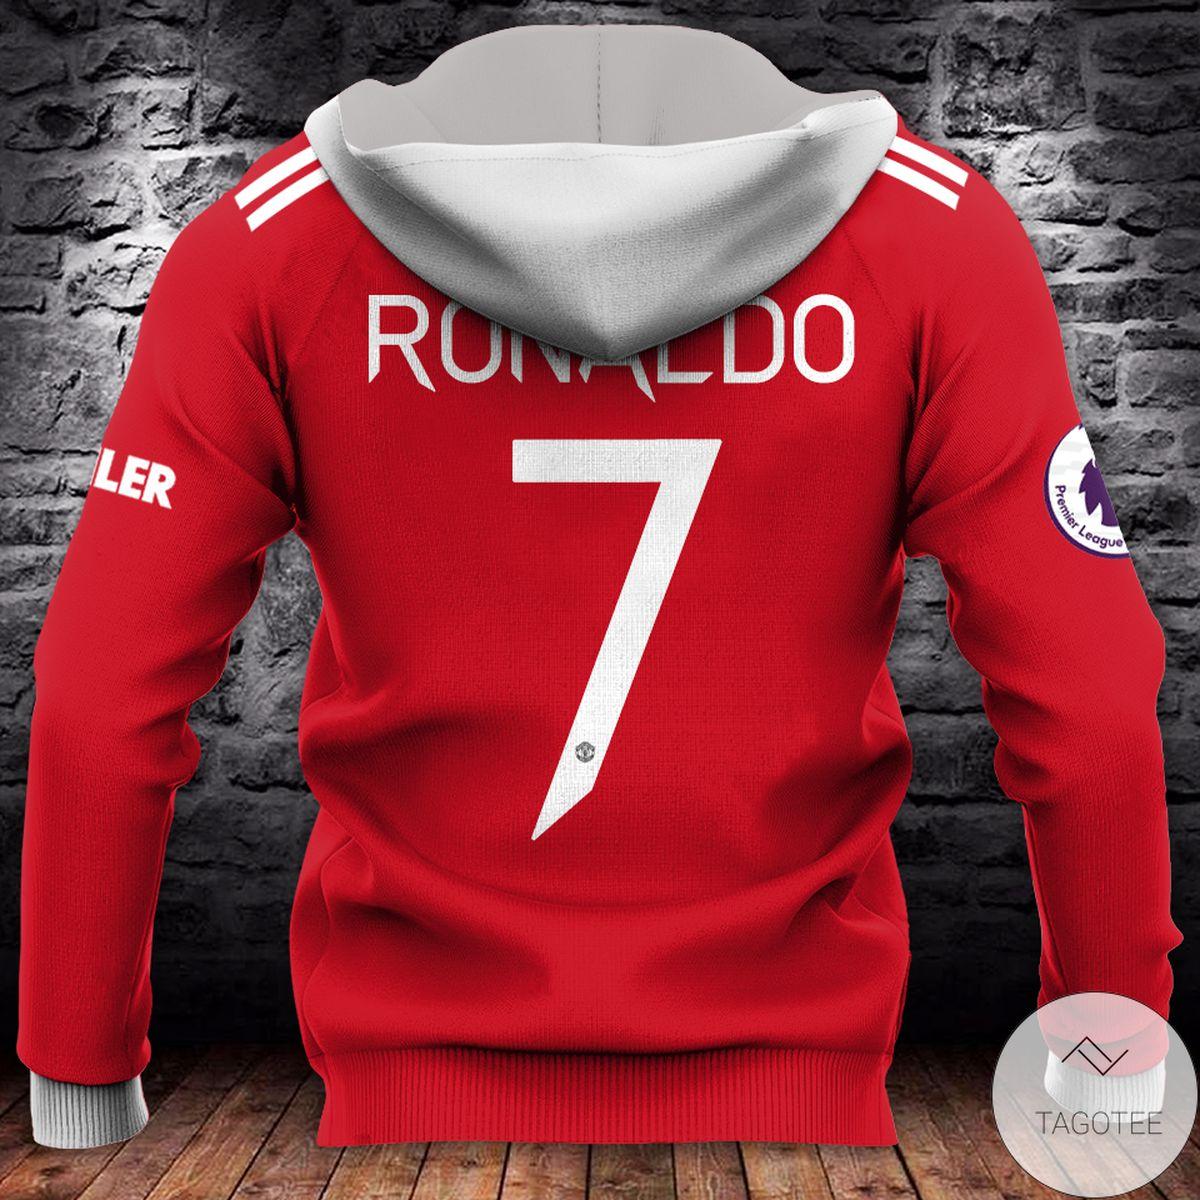 Print On Demand Adidas Manchester United Teamviewer 3d Hoodie